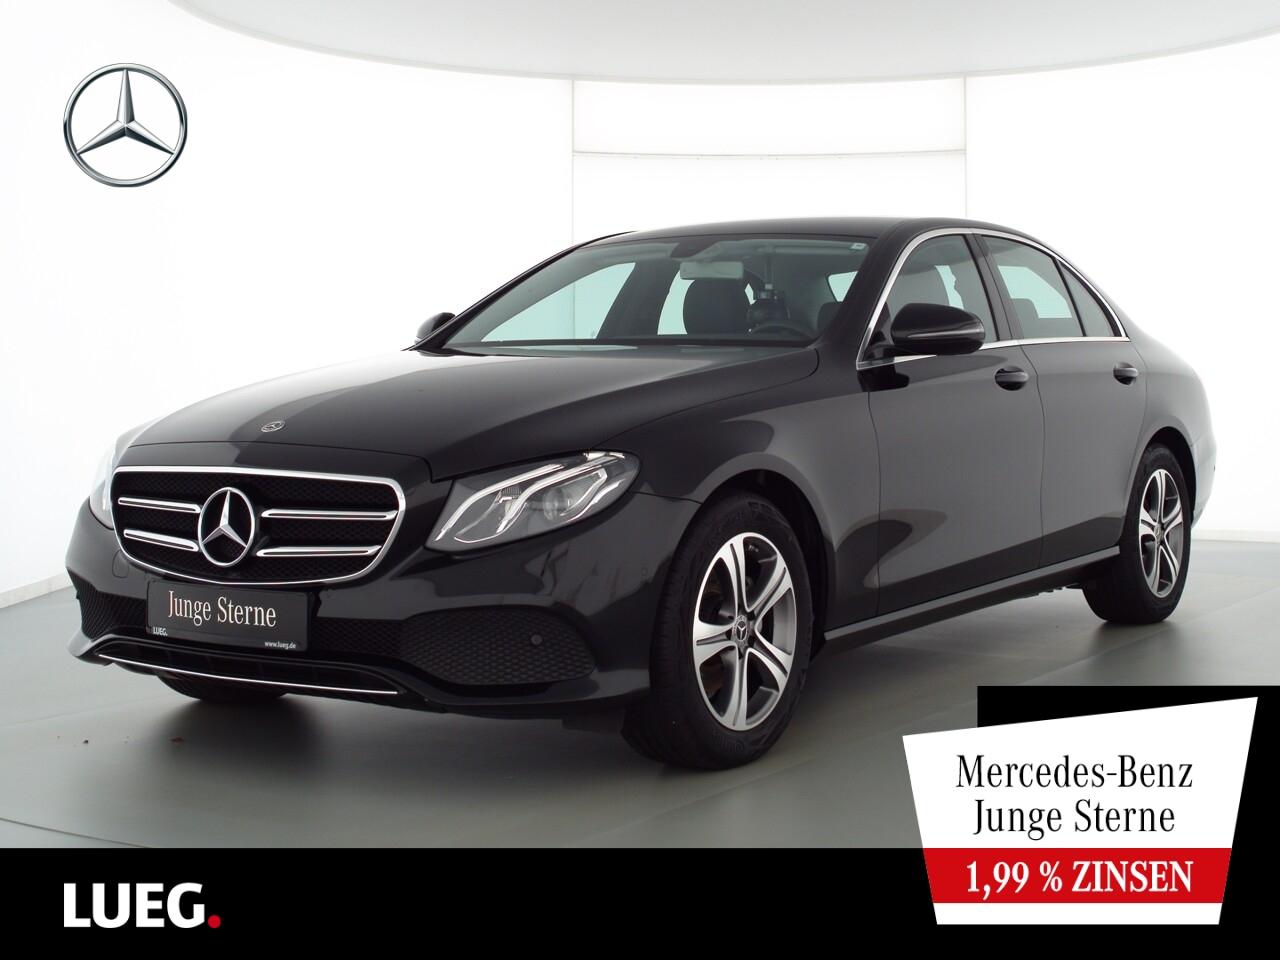 Mercedes-Benz E 200 d Avantgarde+Navi+LED-HP+CarPl+ParkAss+RFK, Jahr 2020, Diesel